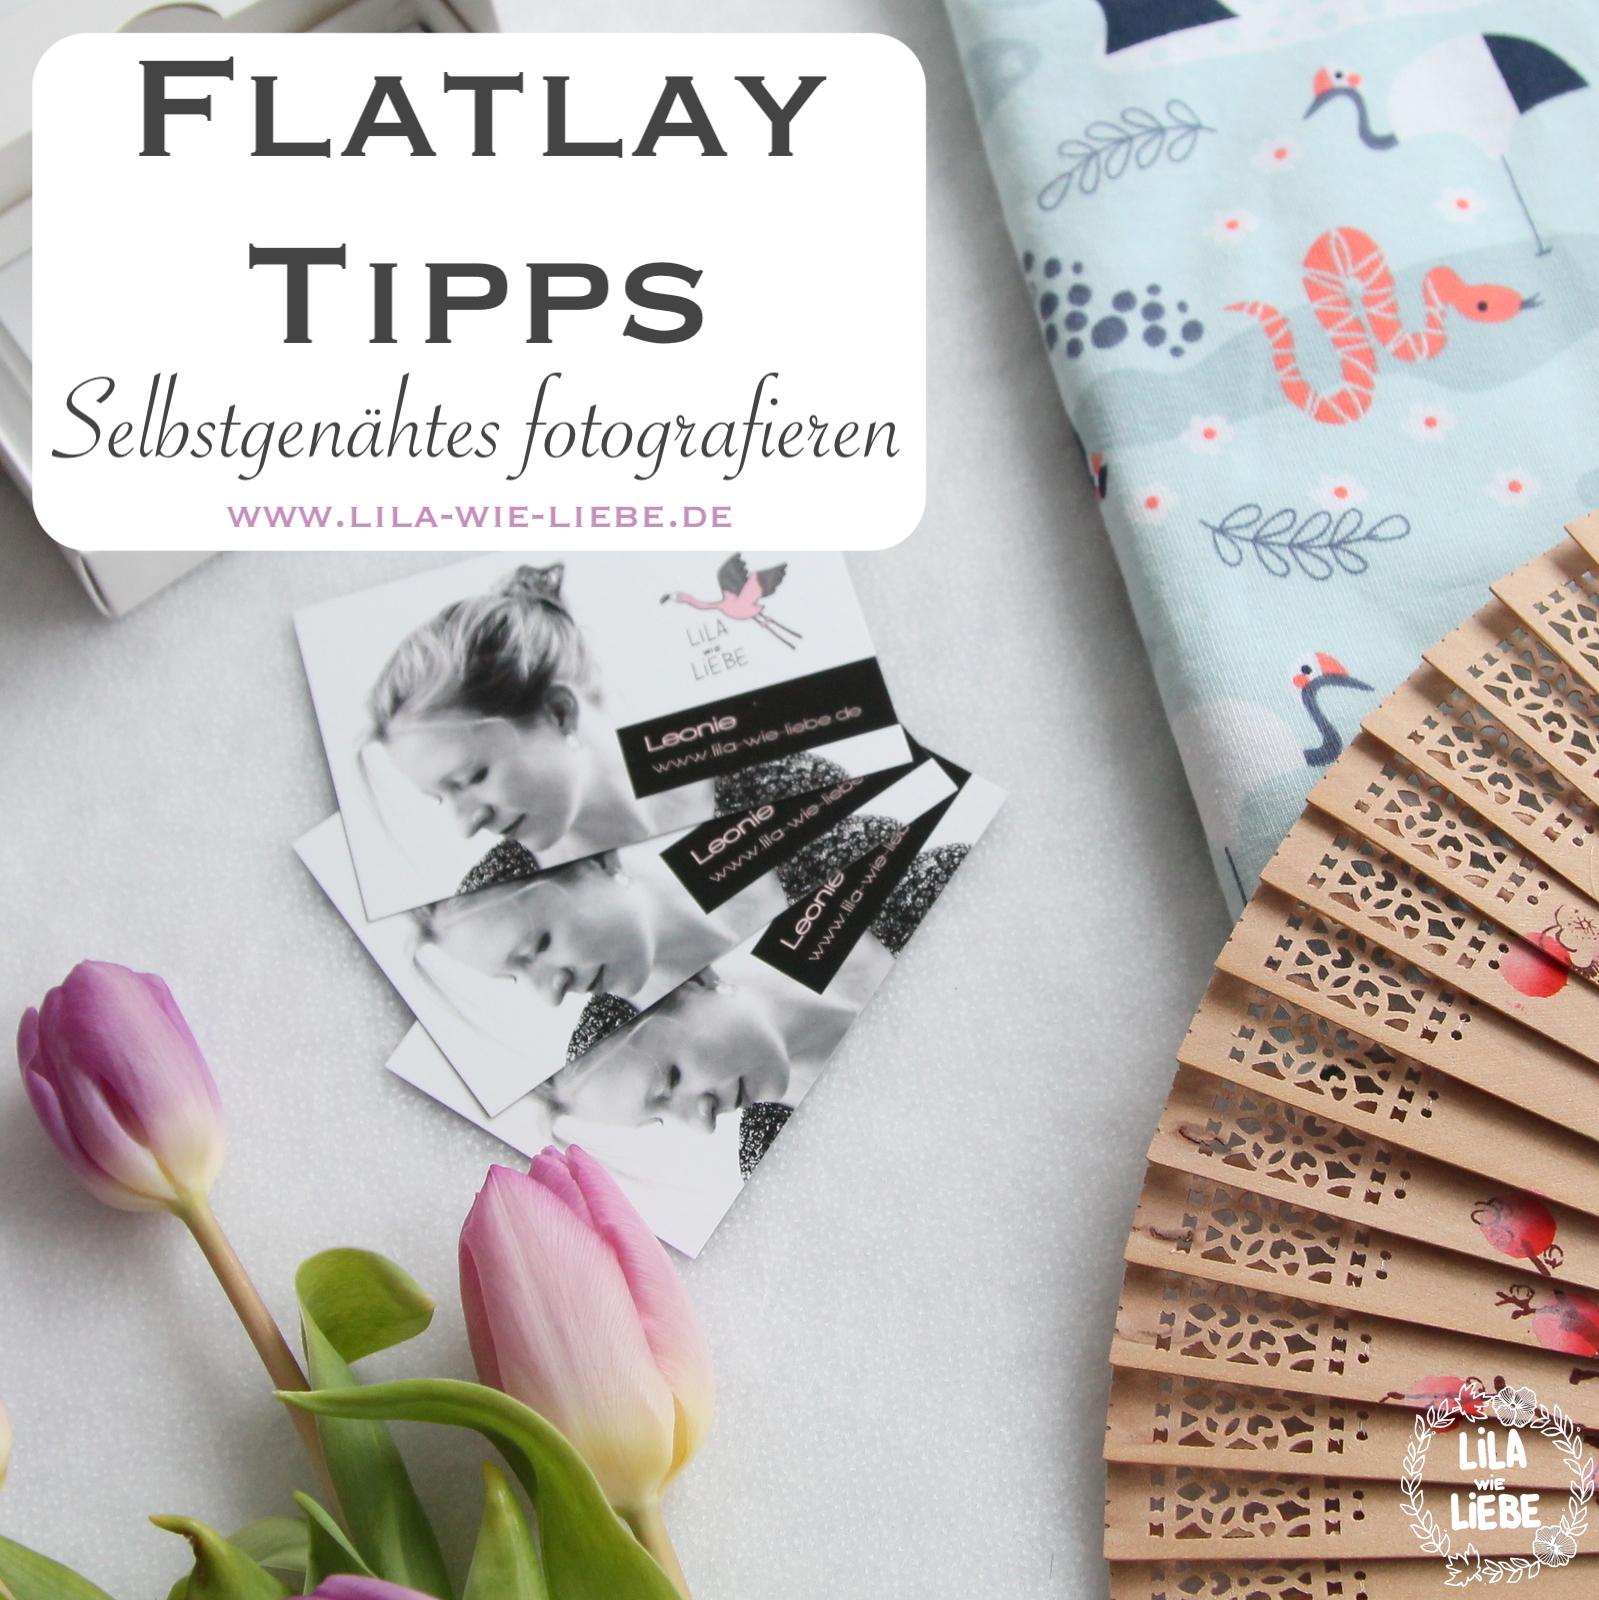 Flatlay Fotografieren Tipps Und Tricks Fur Selbstgenahtes Lila